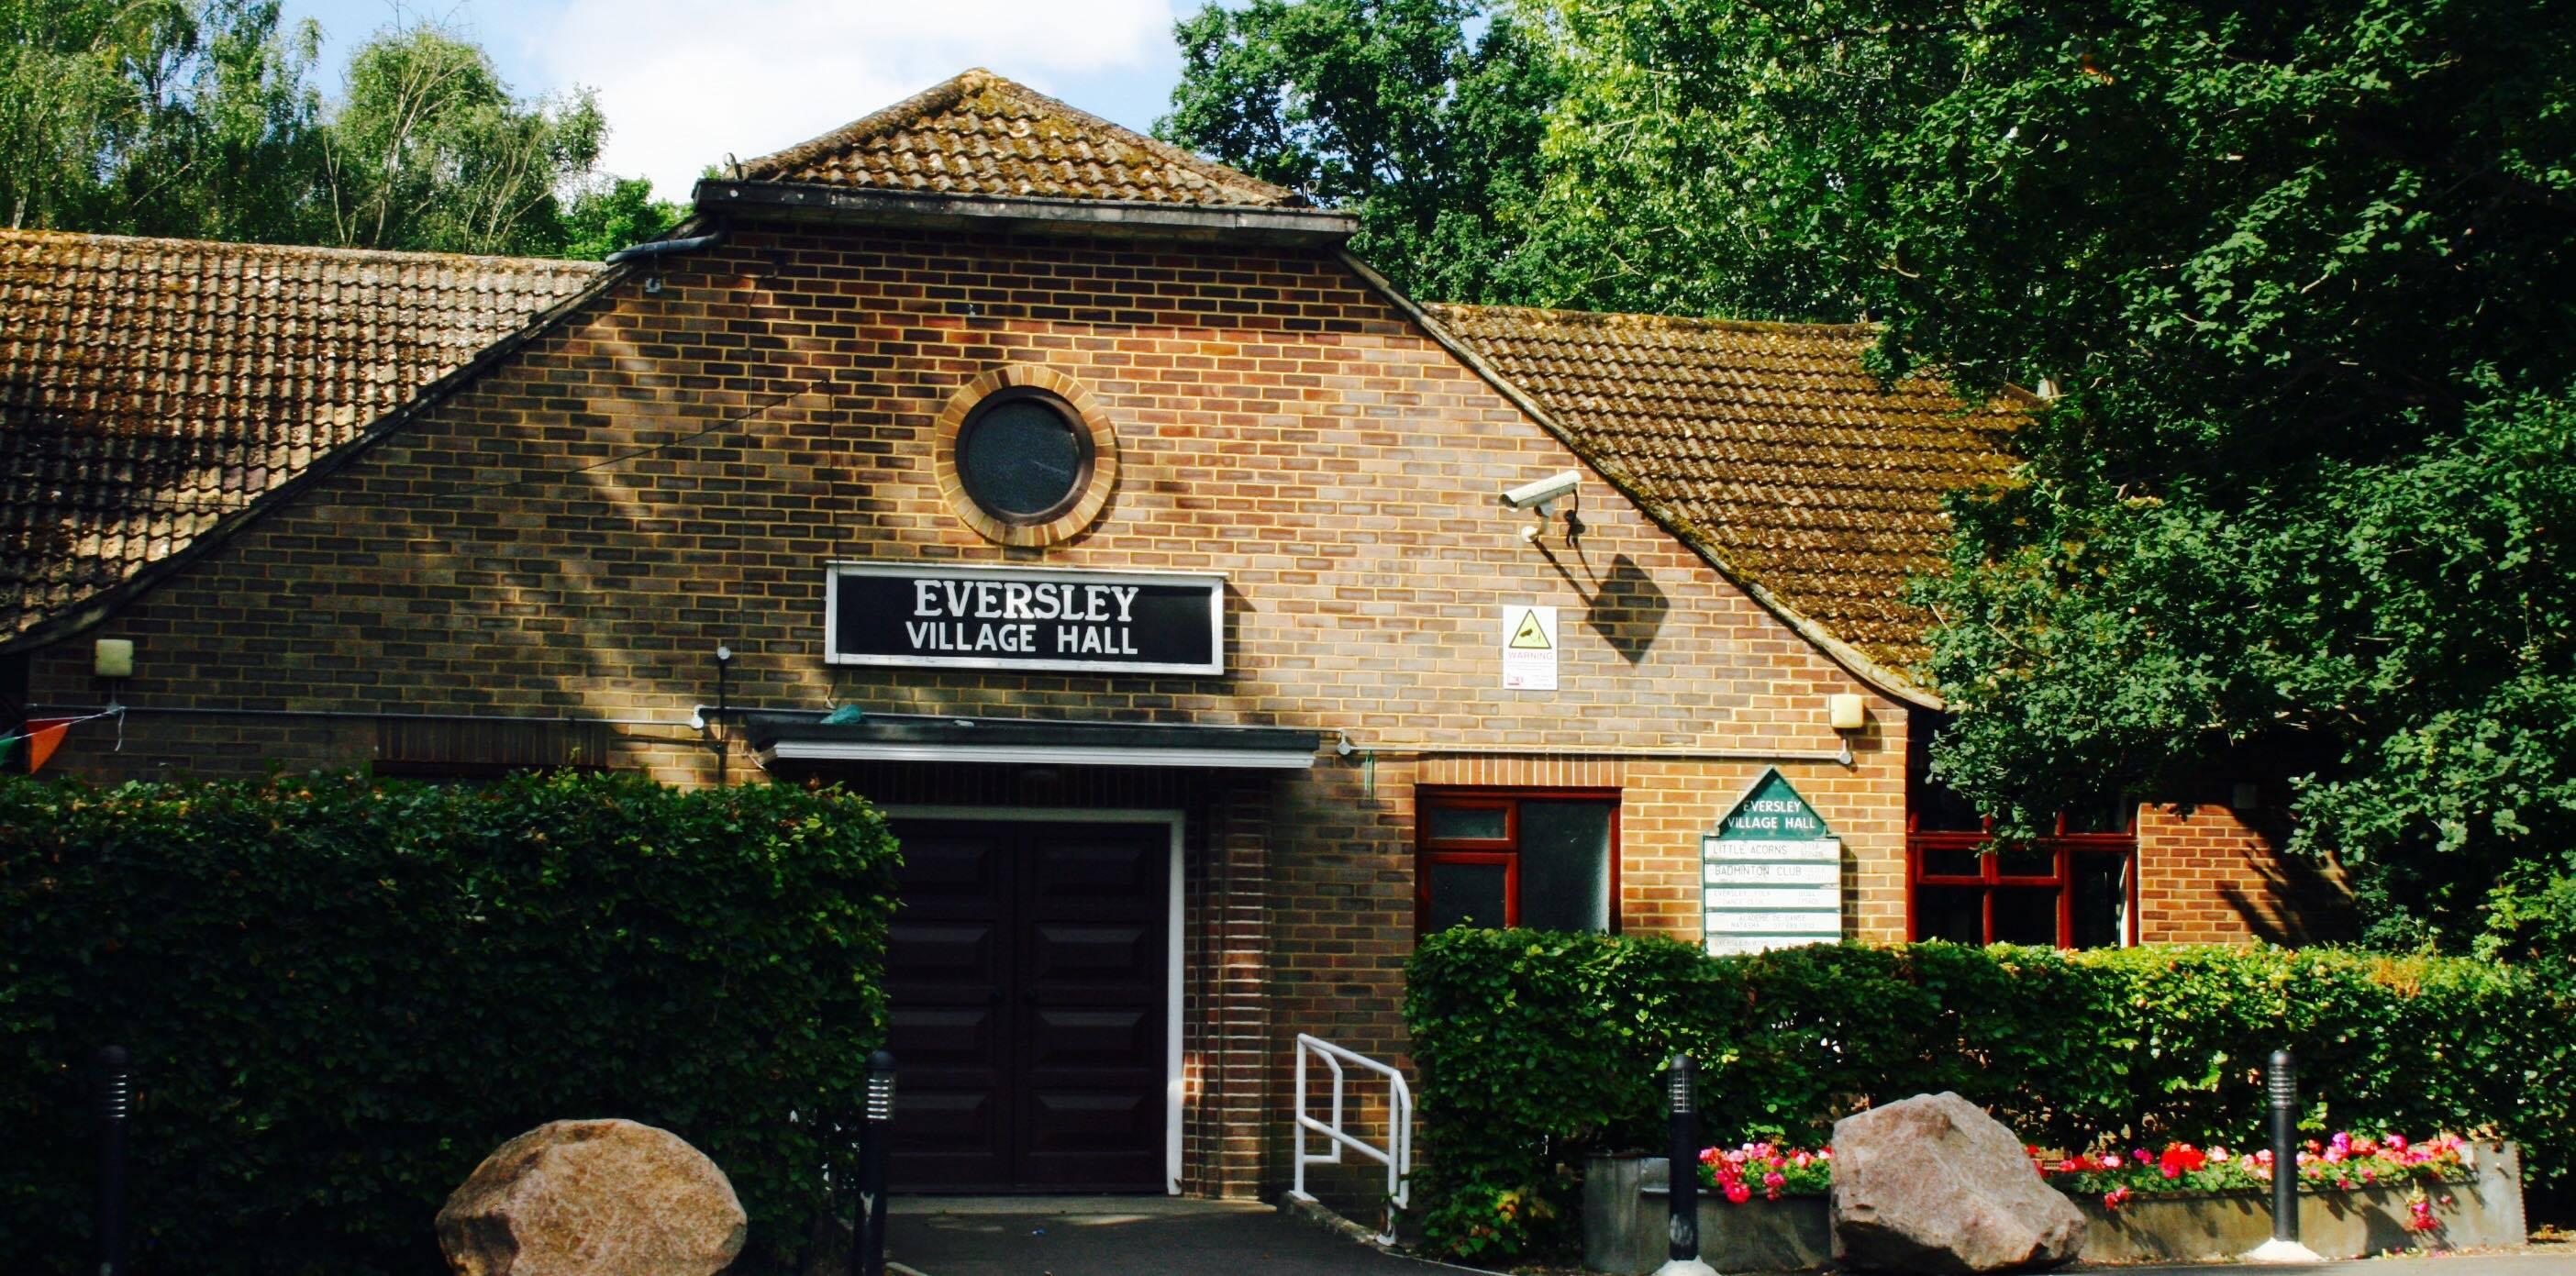 Eversley Village Hall